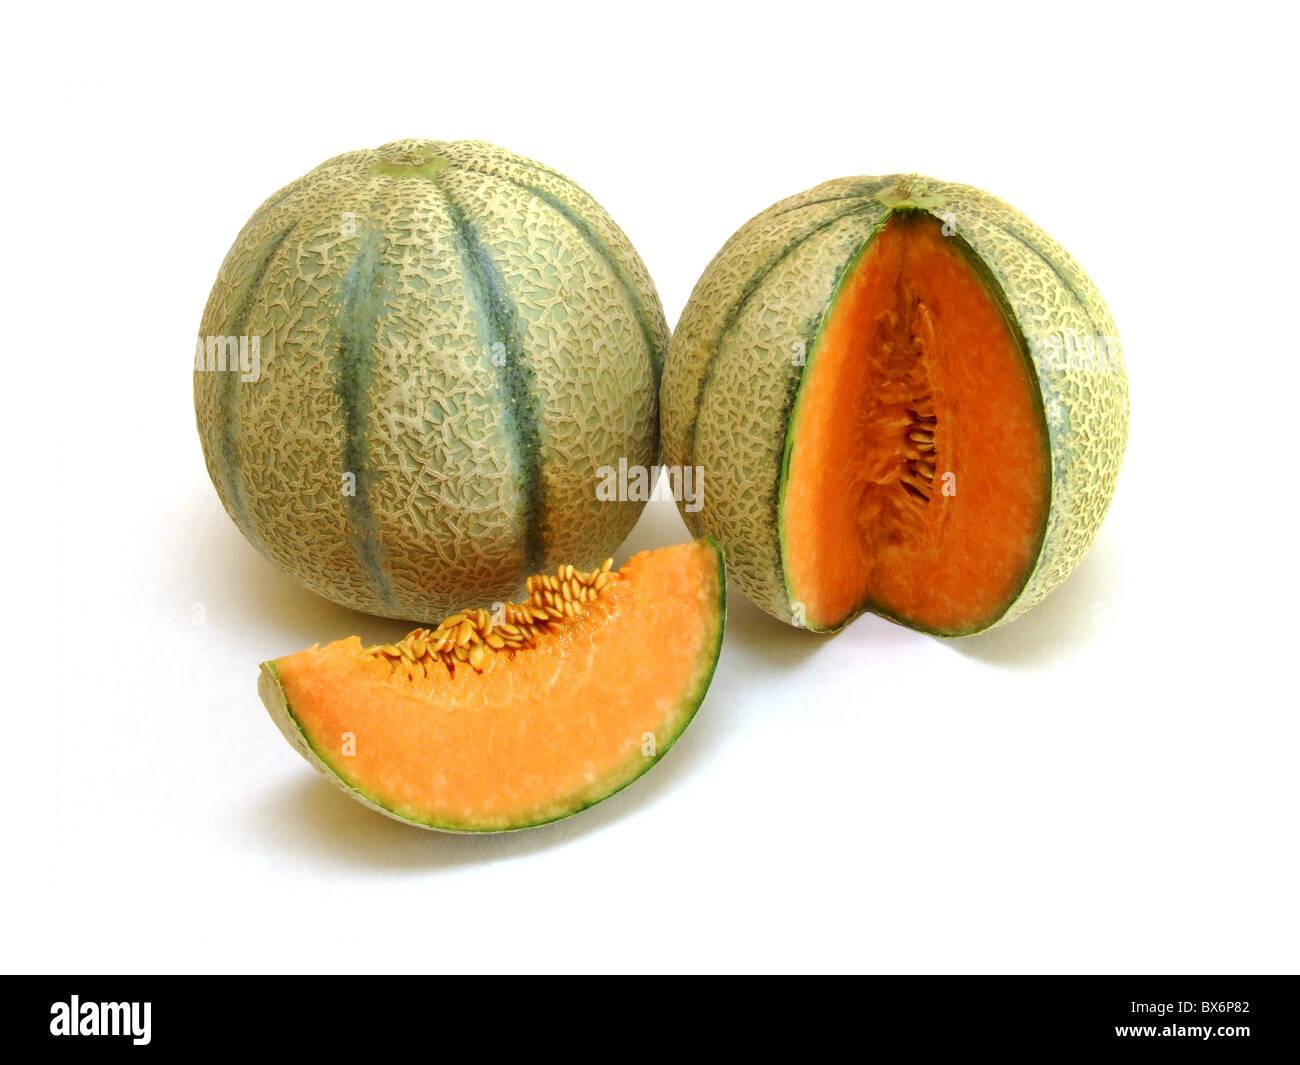 Cantaloupe / melon (Cucumis melo cantalupensis) Stock Photo